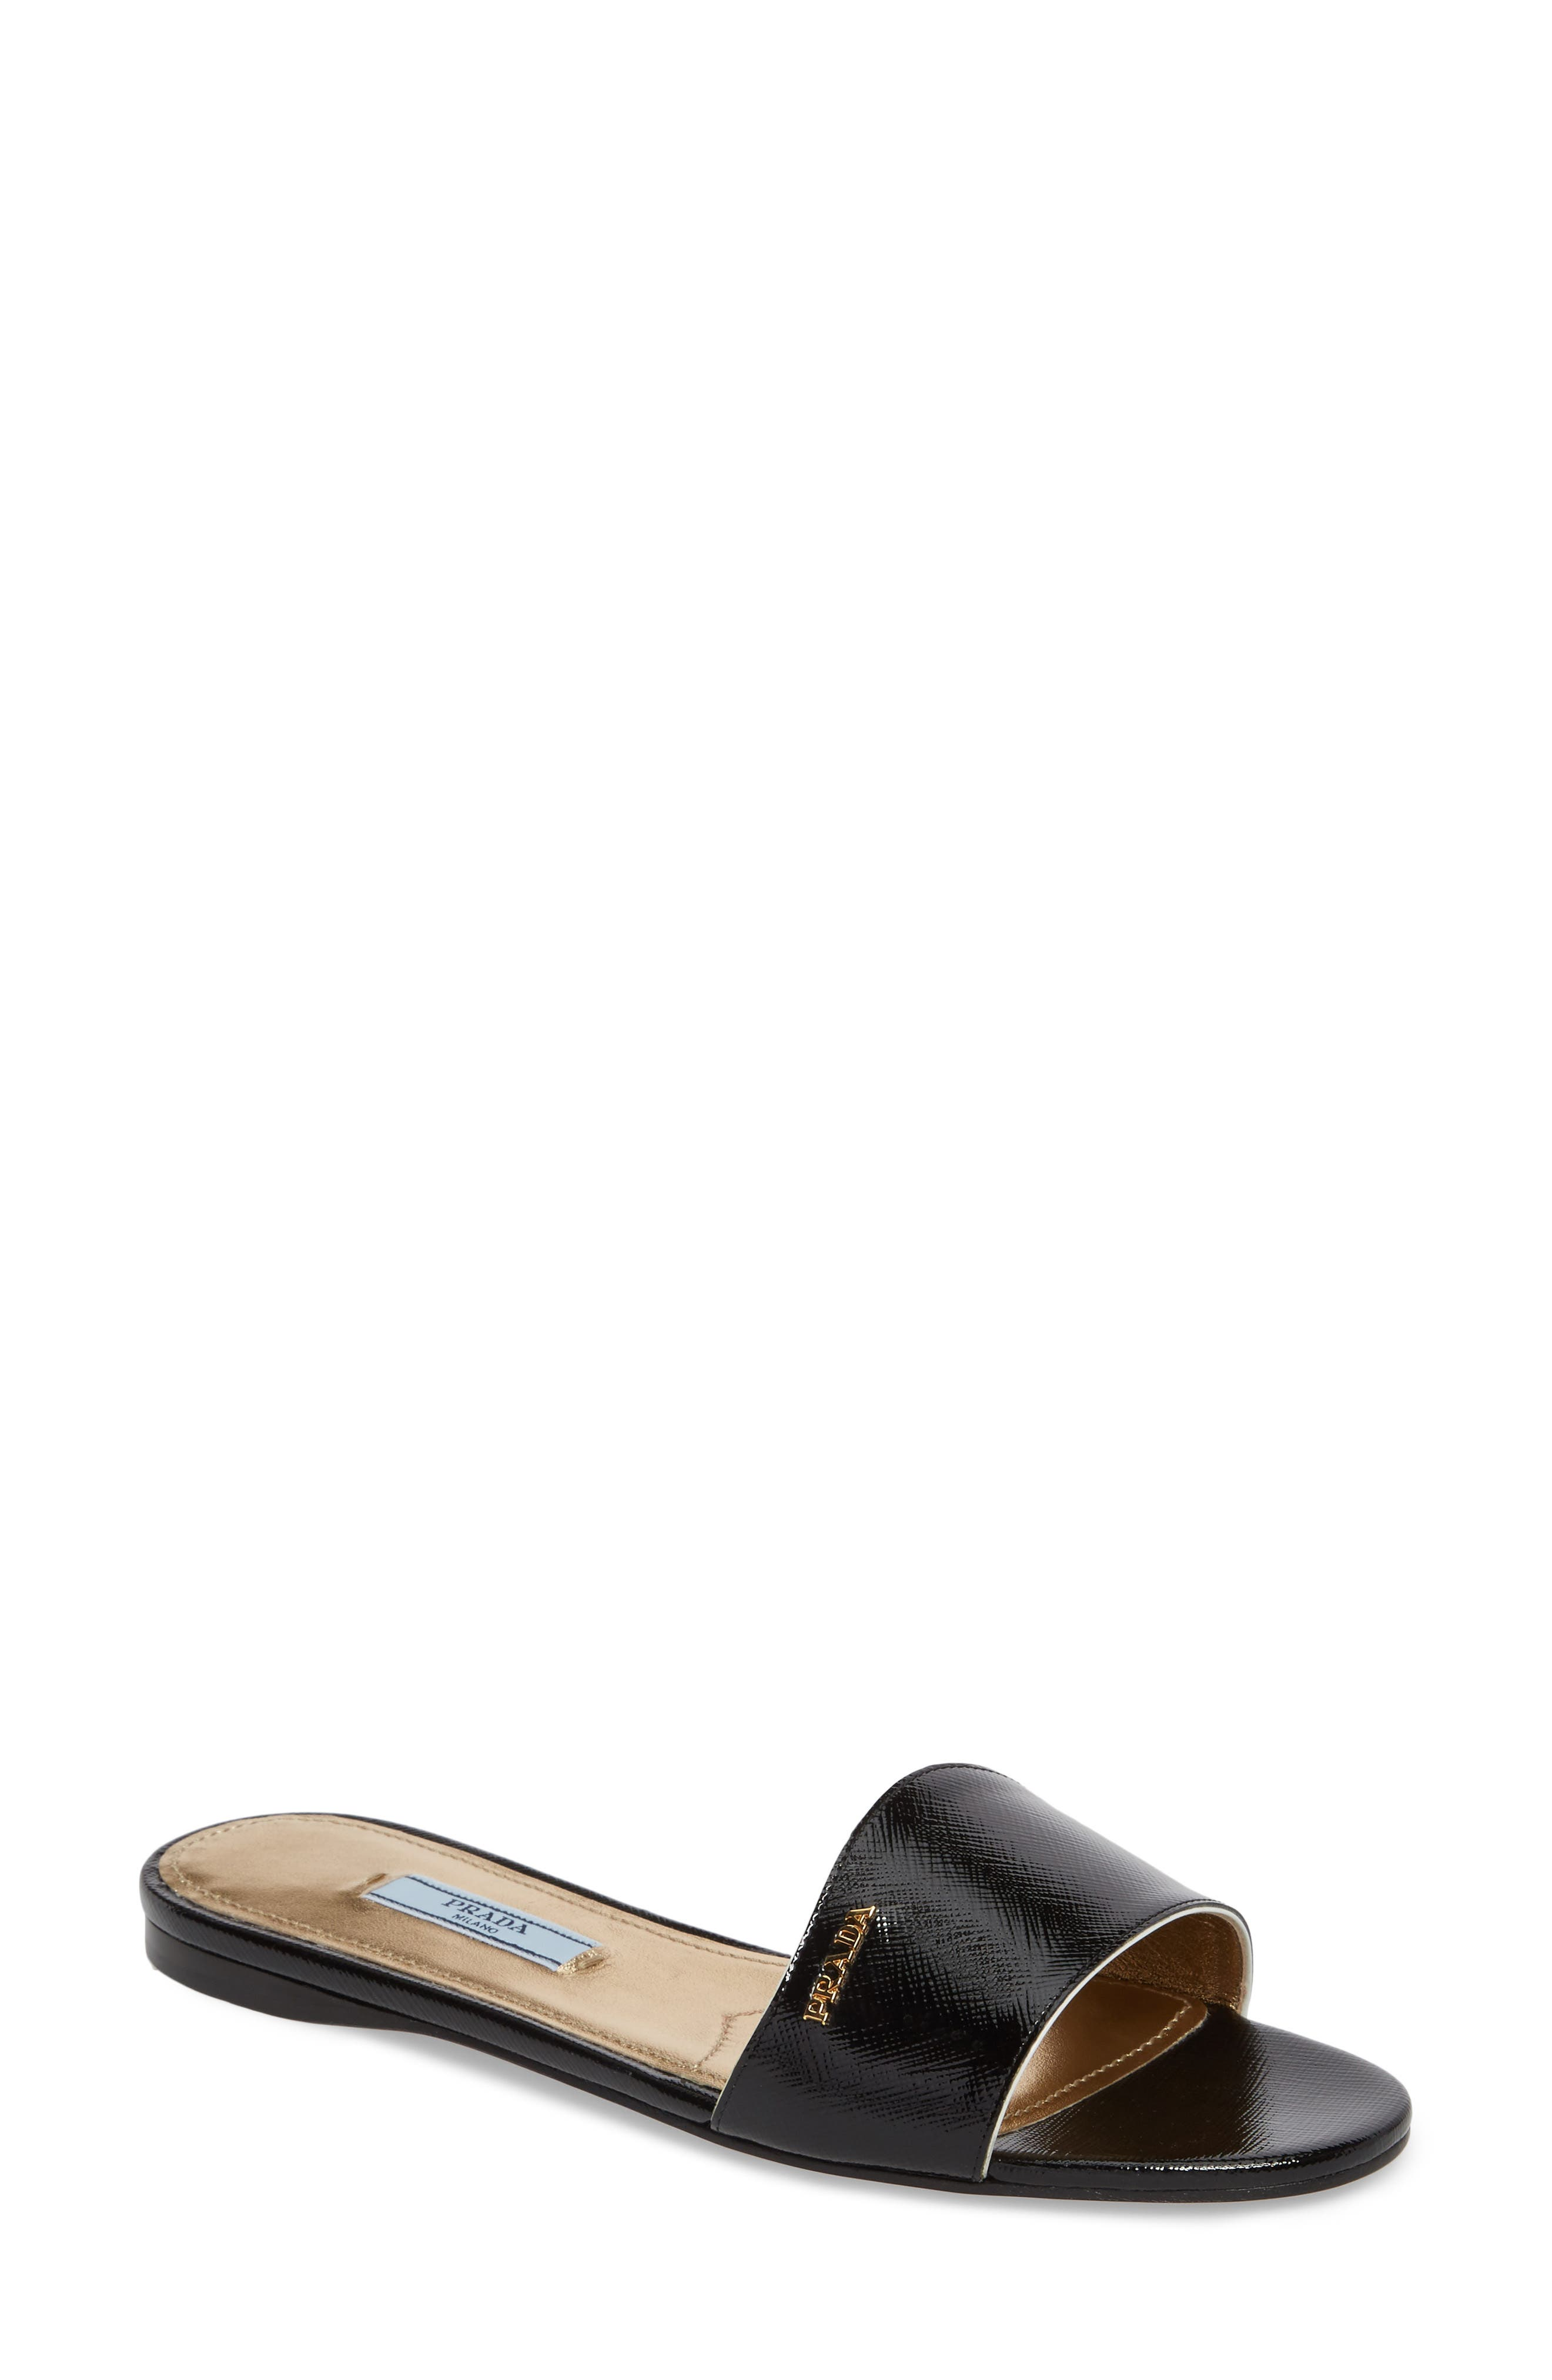 Slide Sandal,                         Main,                         color,